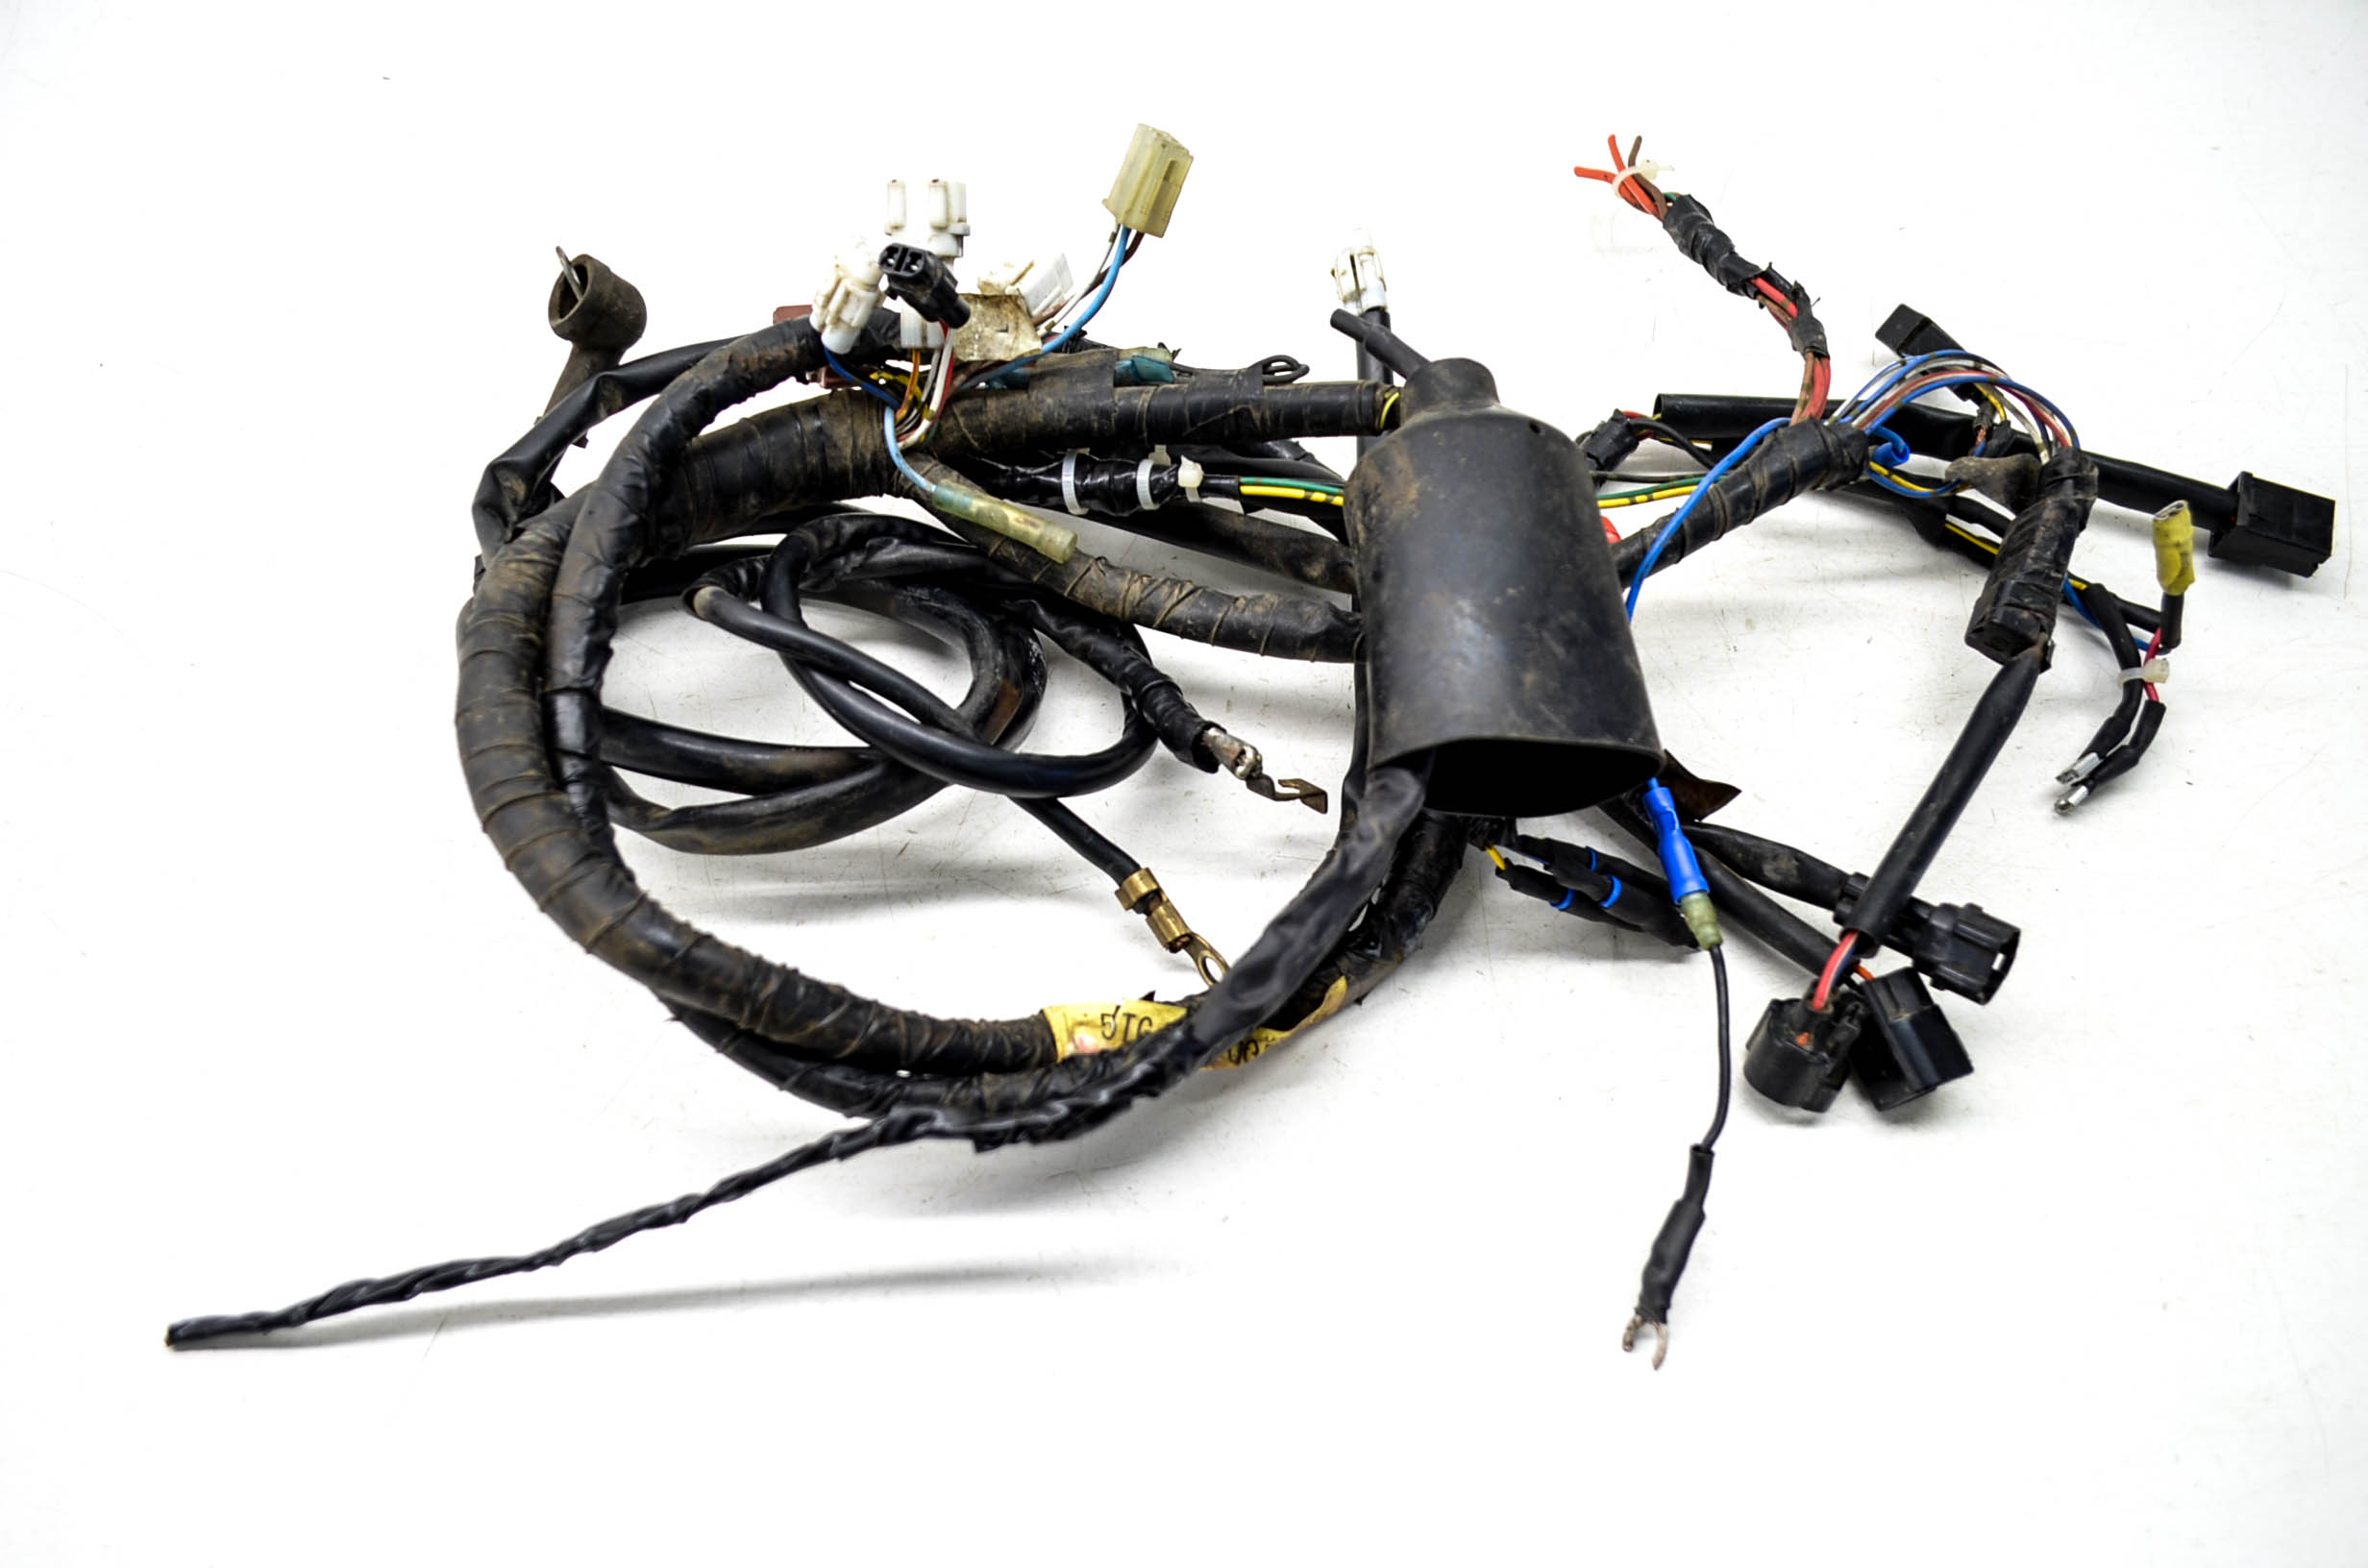 04 yamaha yfz450 wire harness electrical wiring 04 yamaha yfz450 wire harness electrical wiring